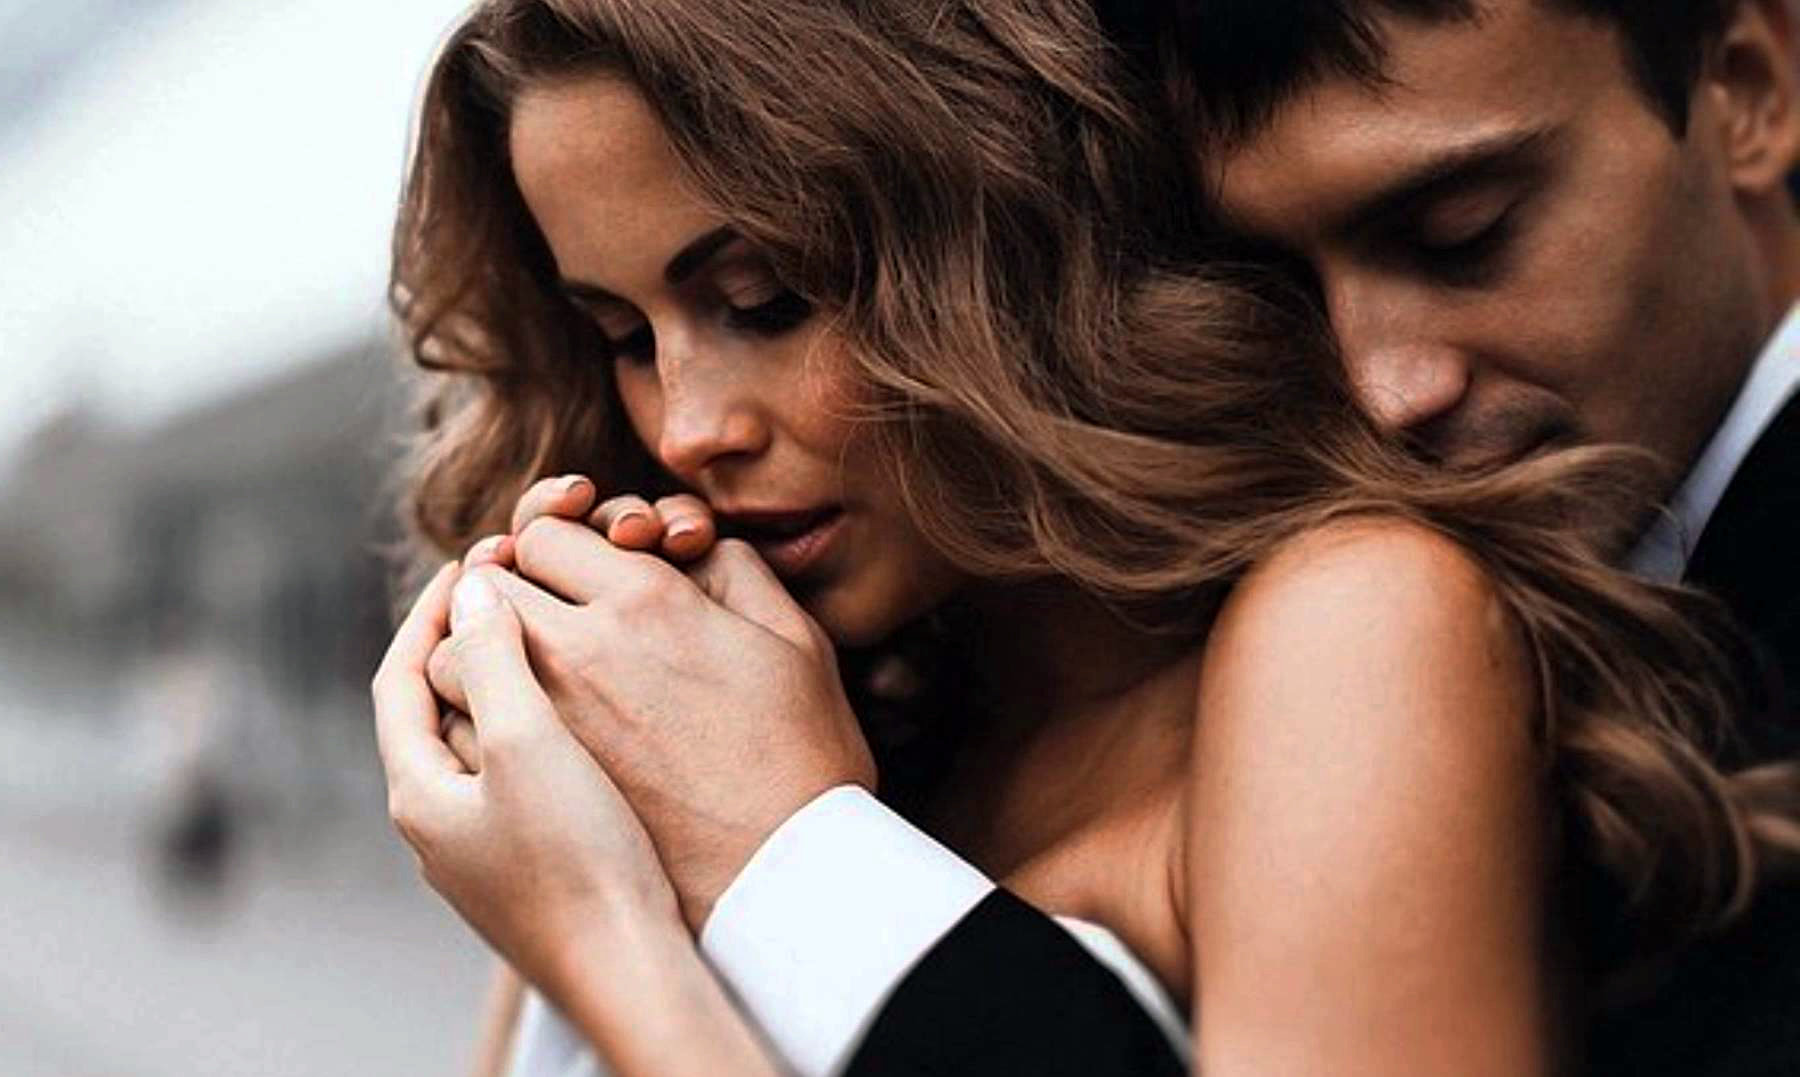 Мужчин объятия мало знакомы психология